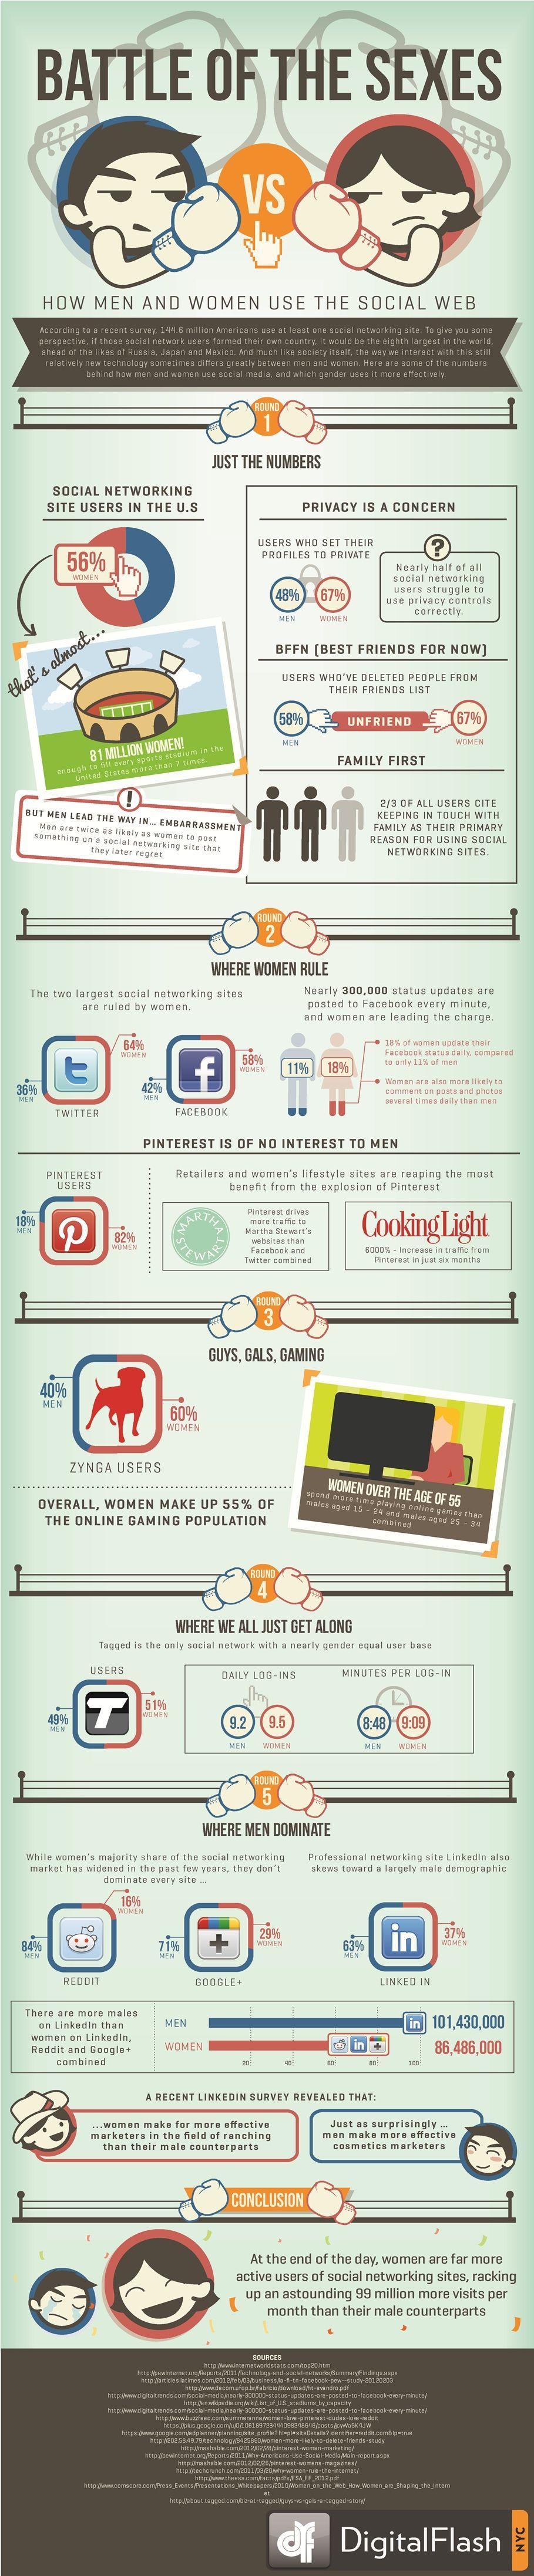 Battle of The Sexes Social Web